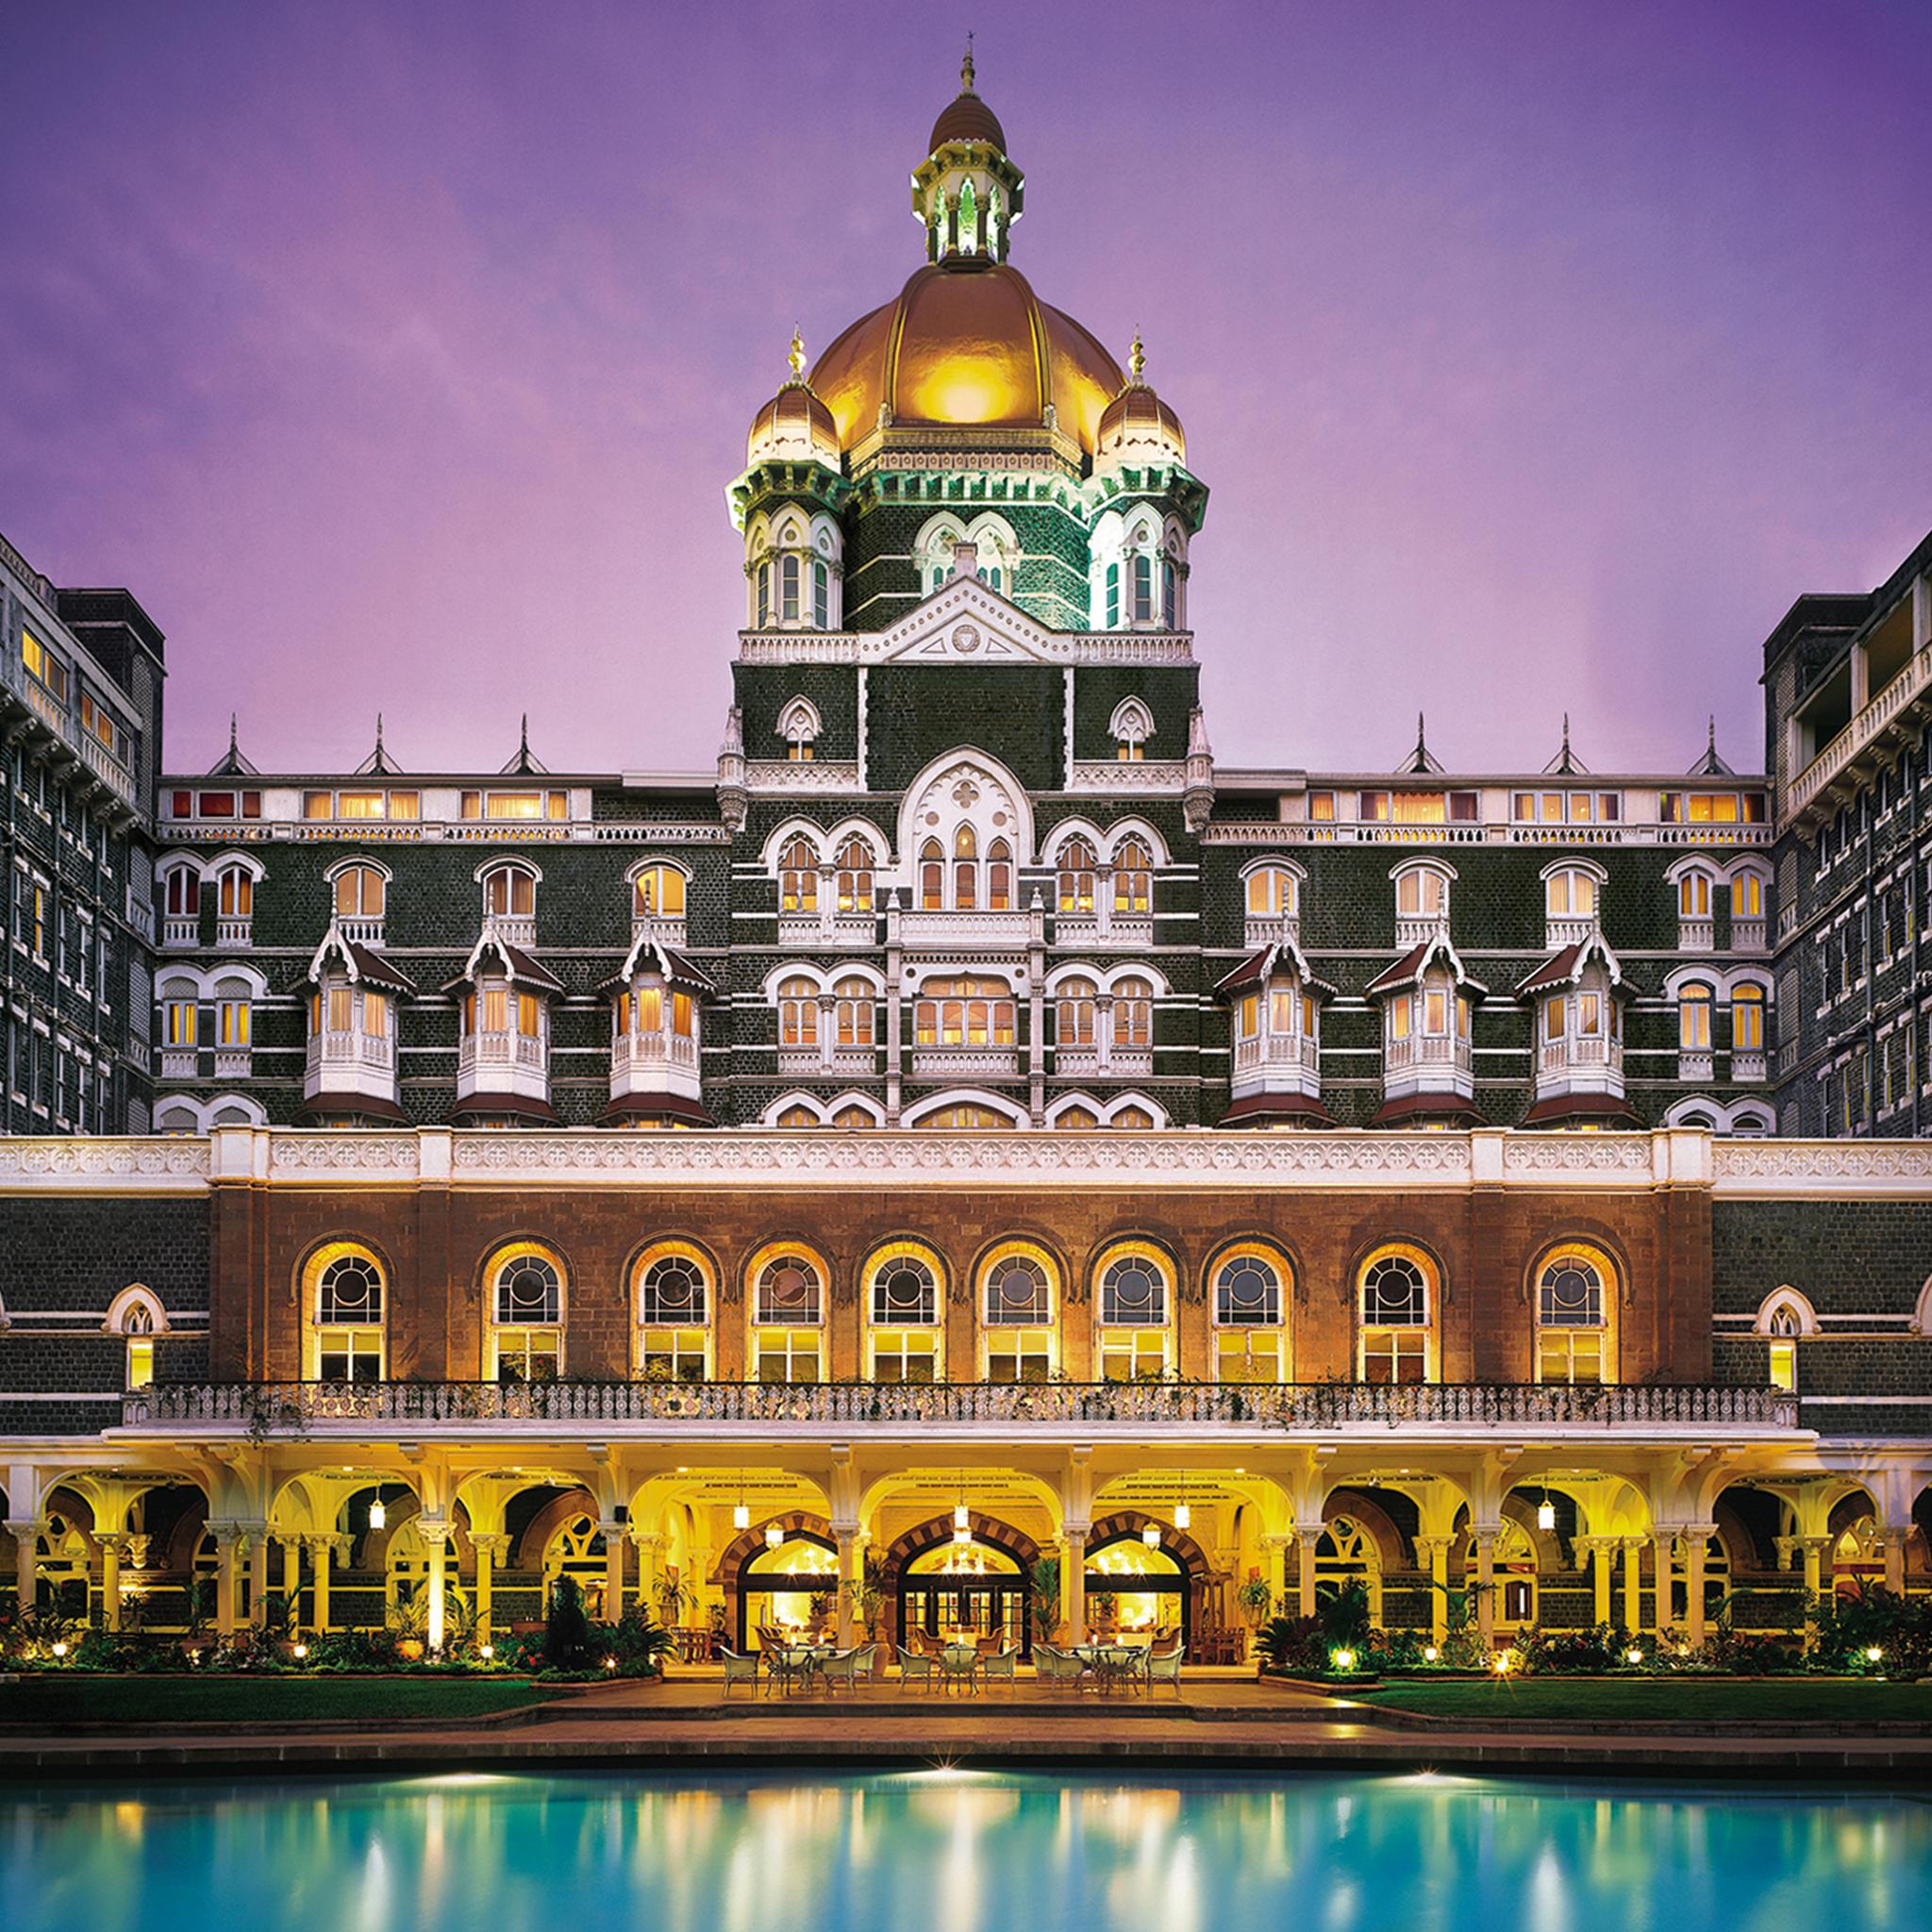 Taj-Mahal-Palace-3Wallpapers-ipad-Retina